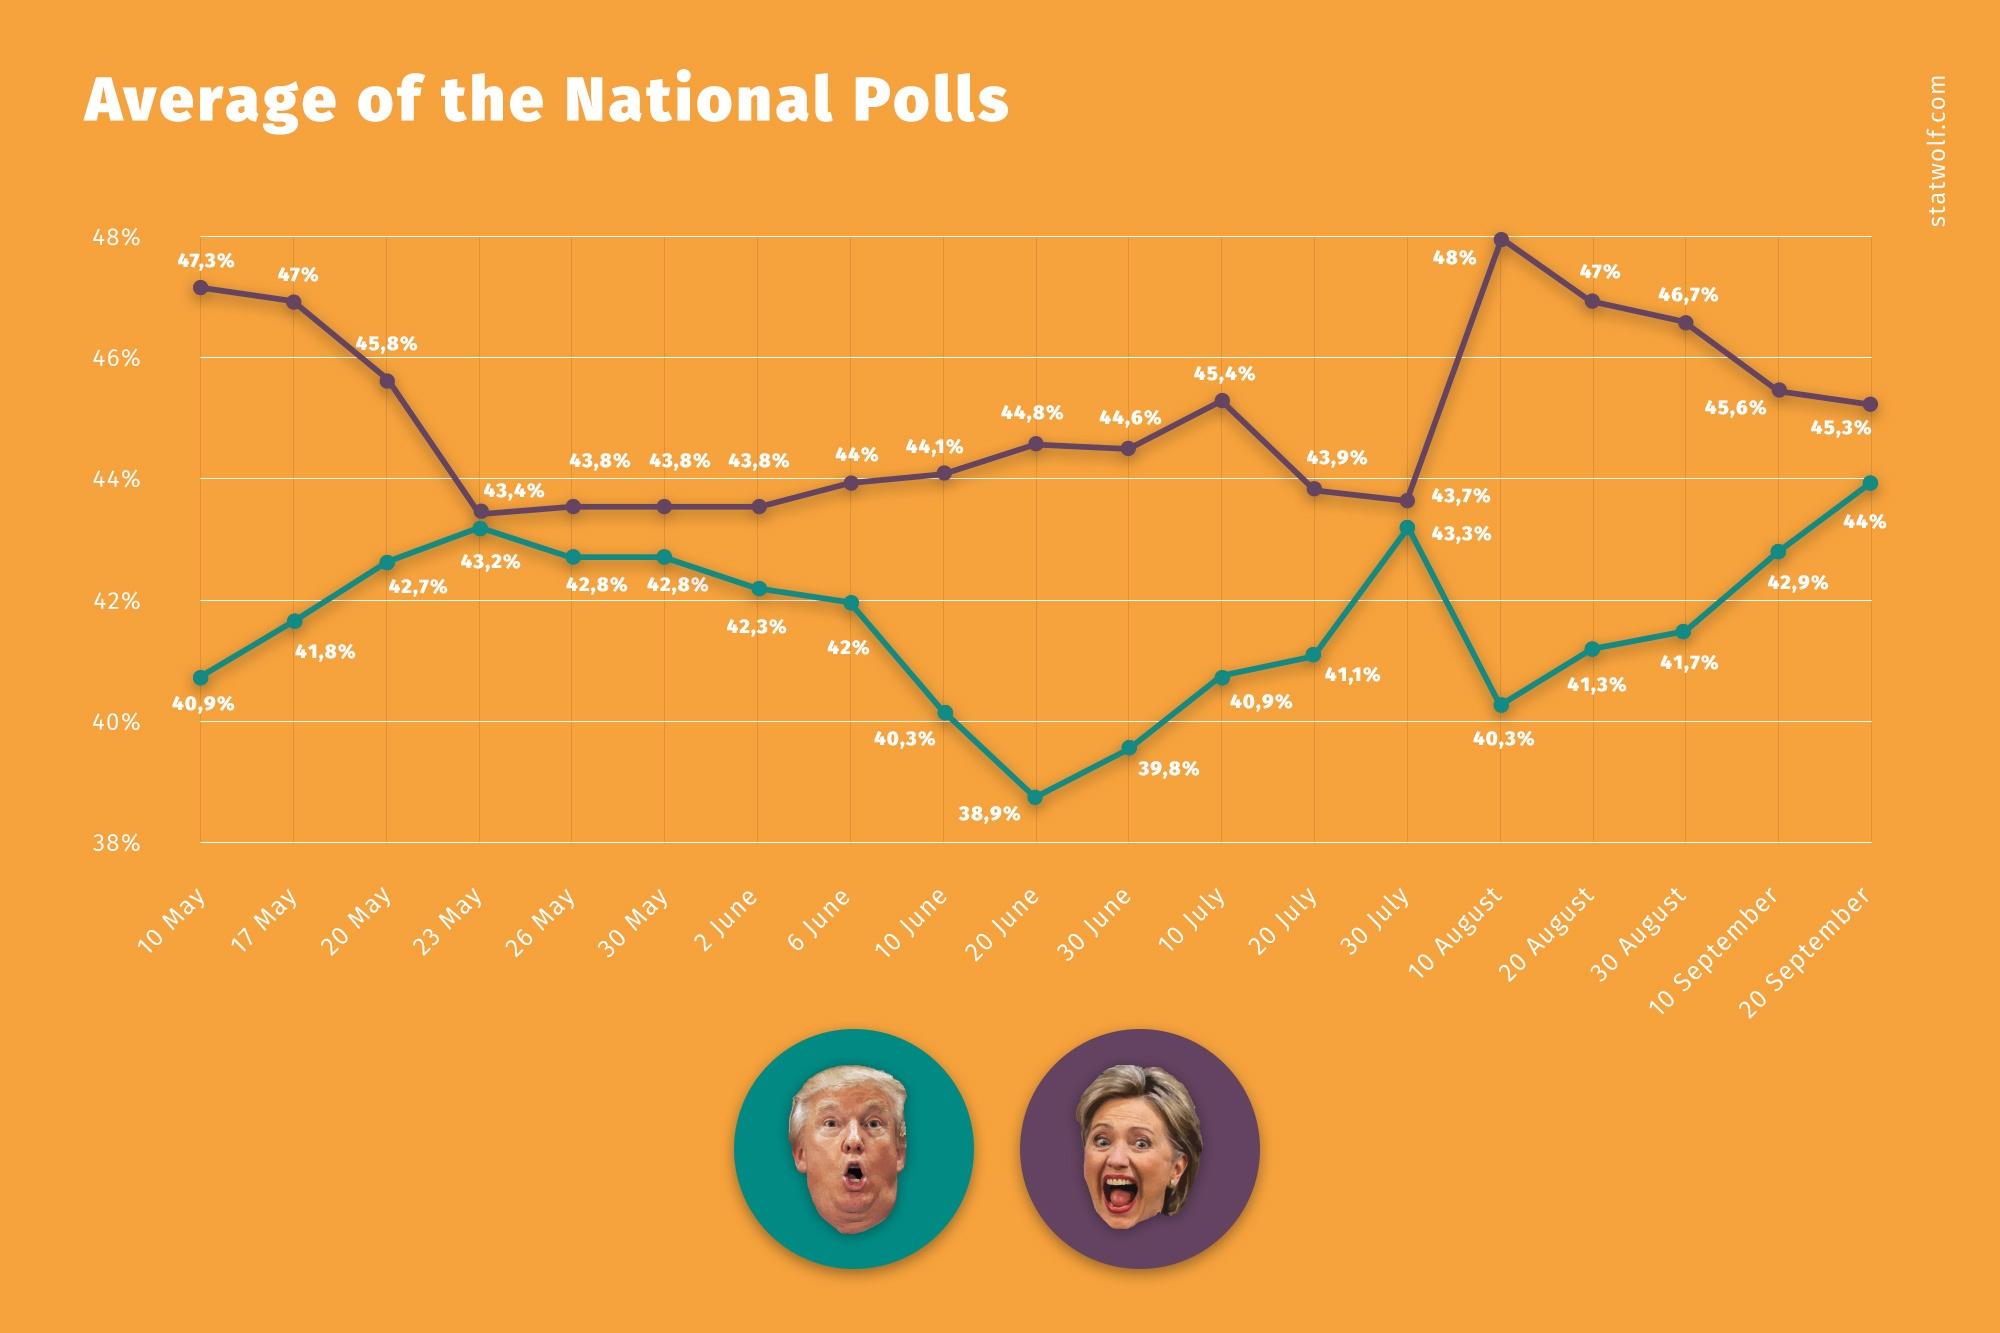 Average Of National Polls